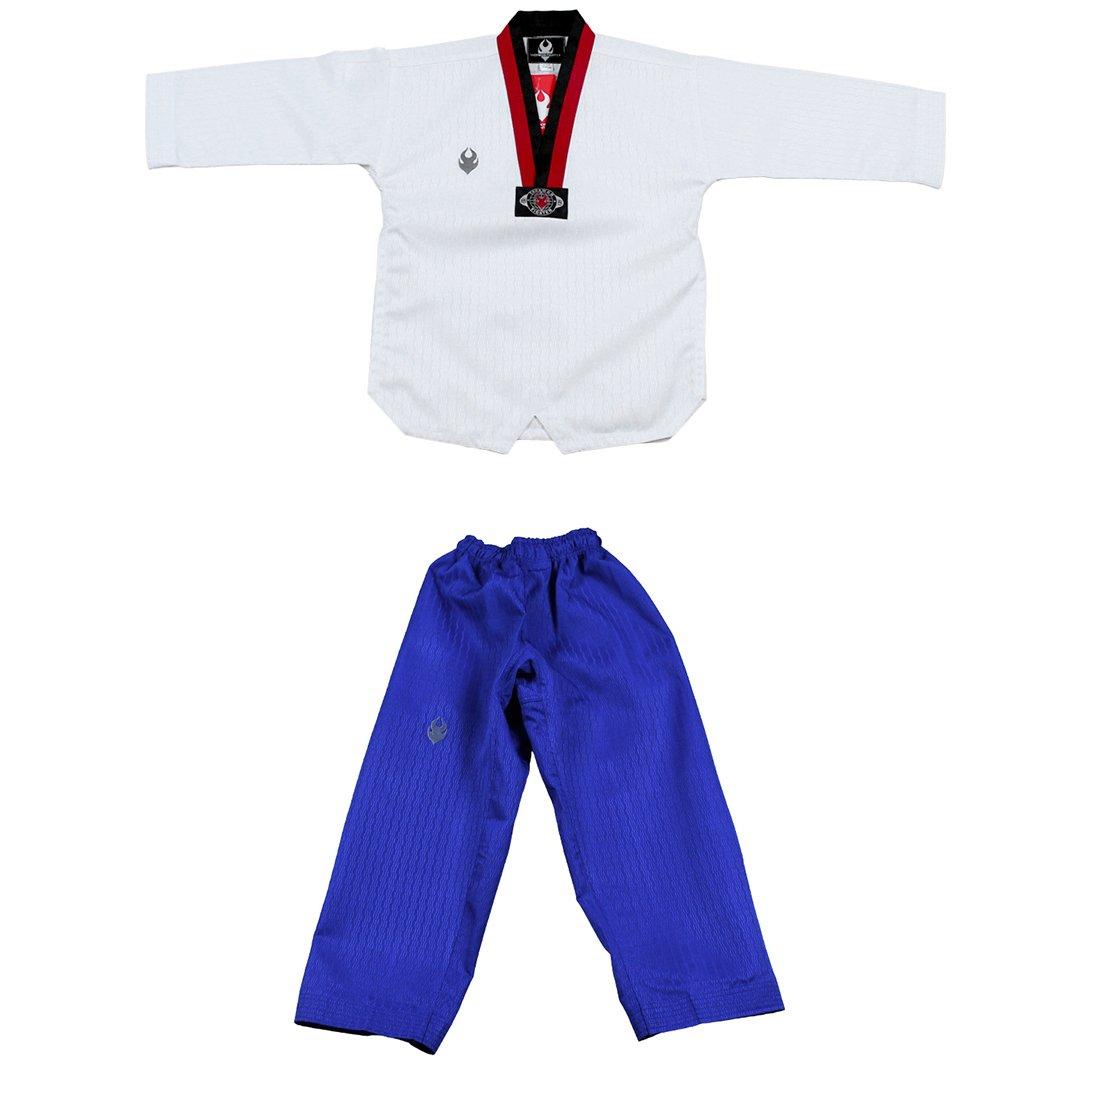 Taekwondo Poom Uniform Poom V-Neck and Blue Pants Martial Arts MMA TKD Karate Judo Hapkido (170(Height: 160~170cm)(62.9~66.9 inch)) by Taekwondo